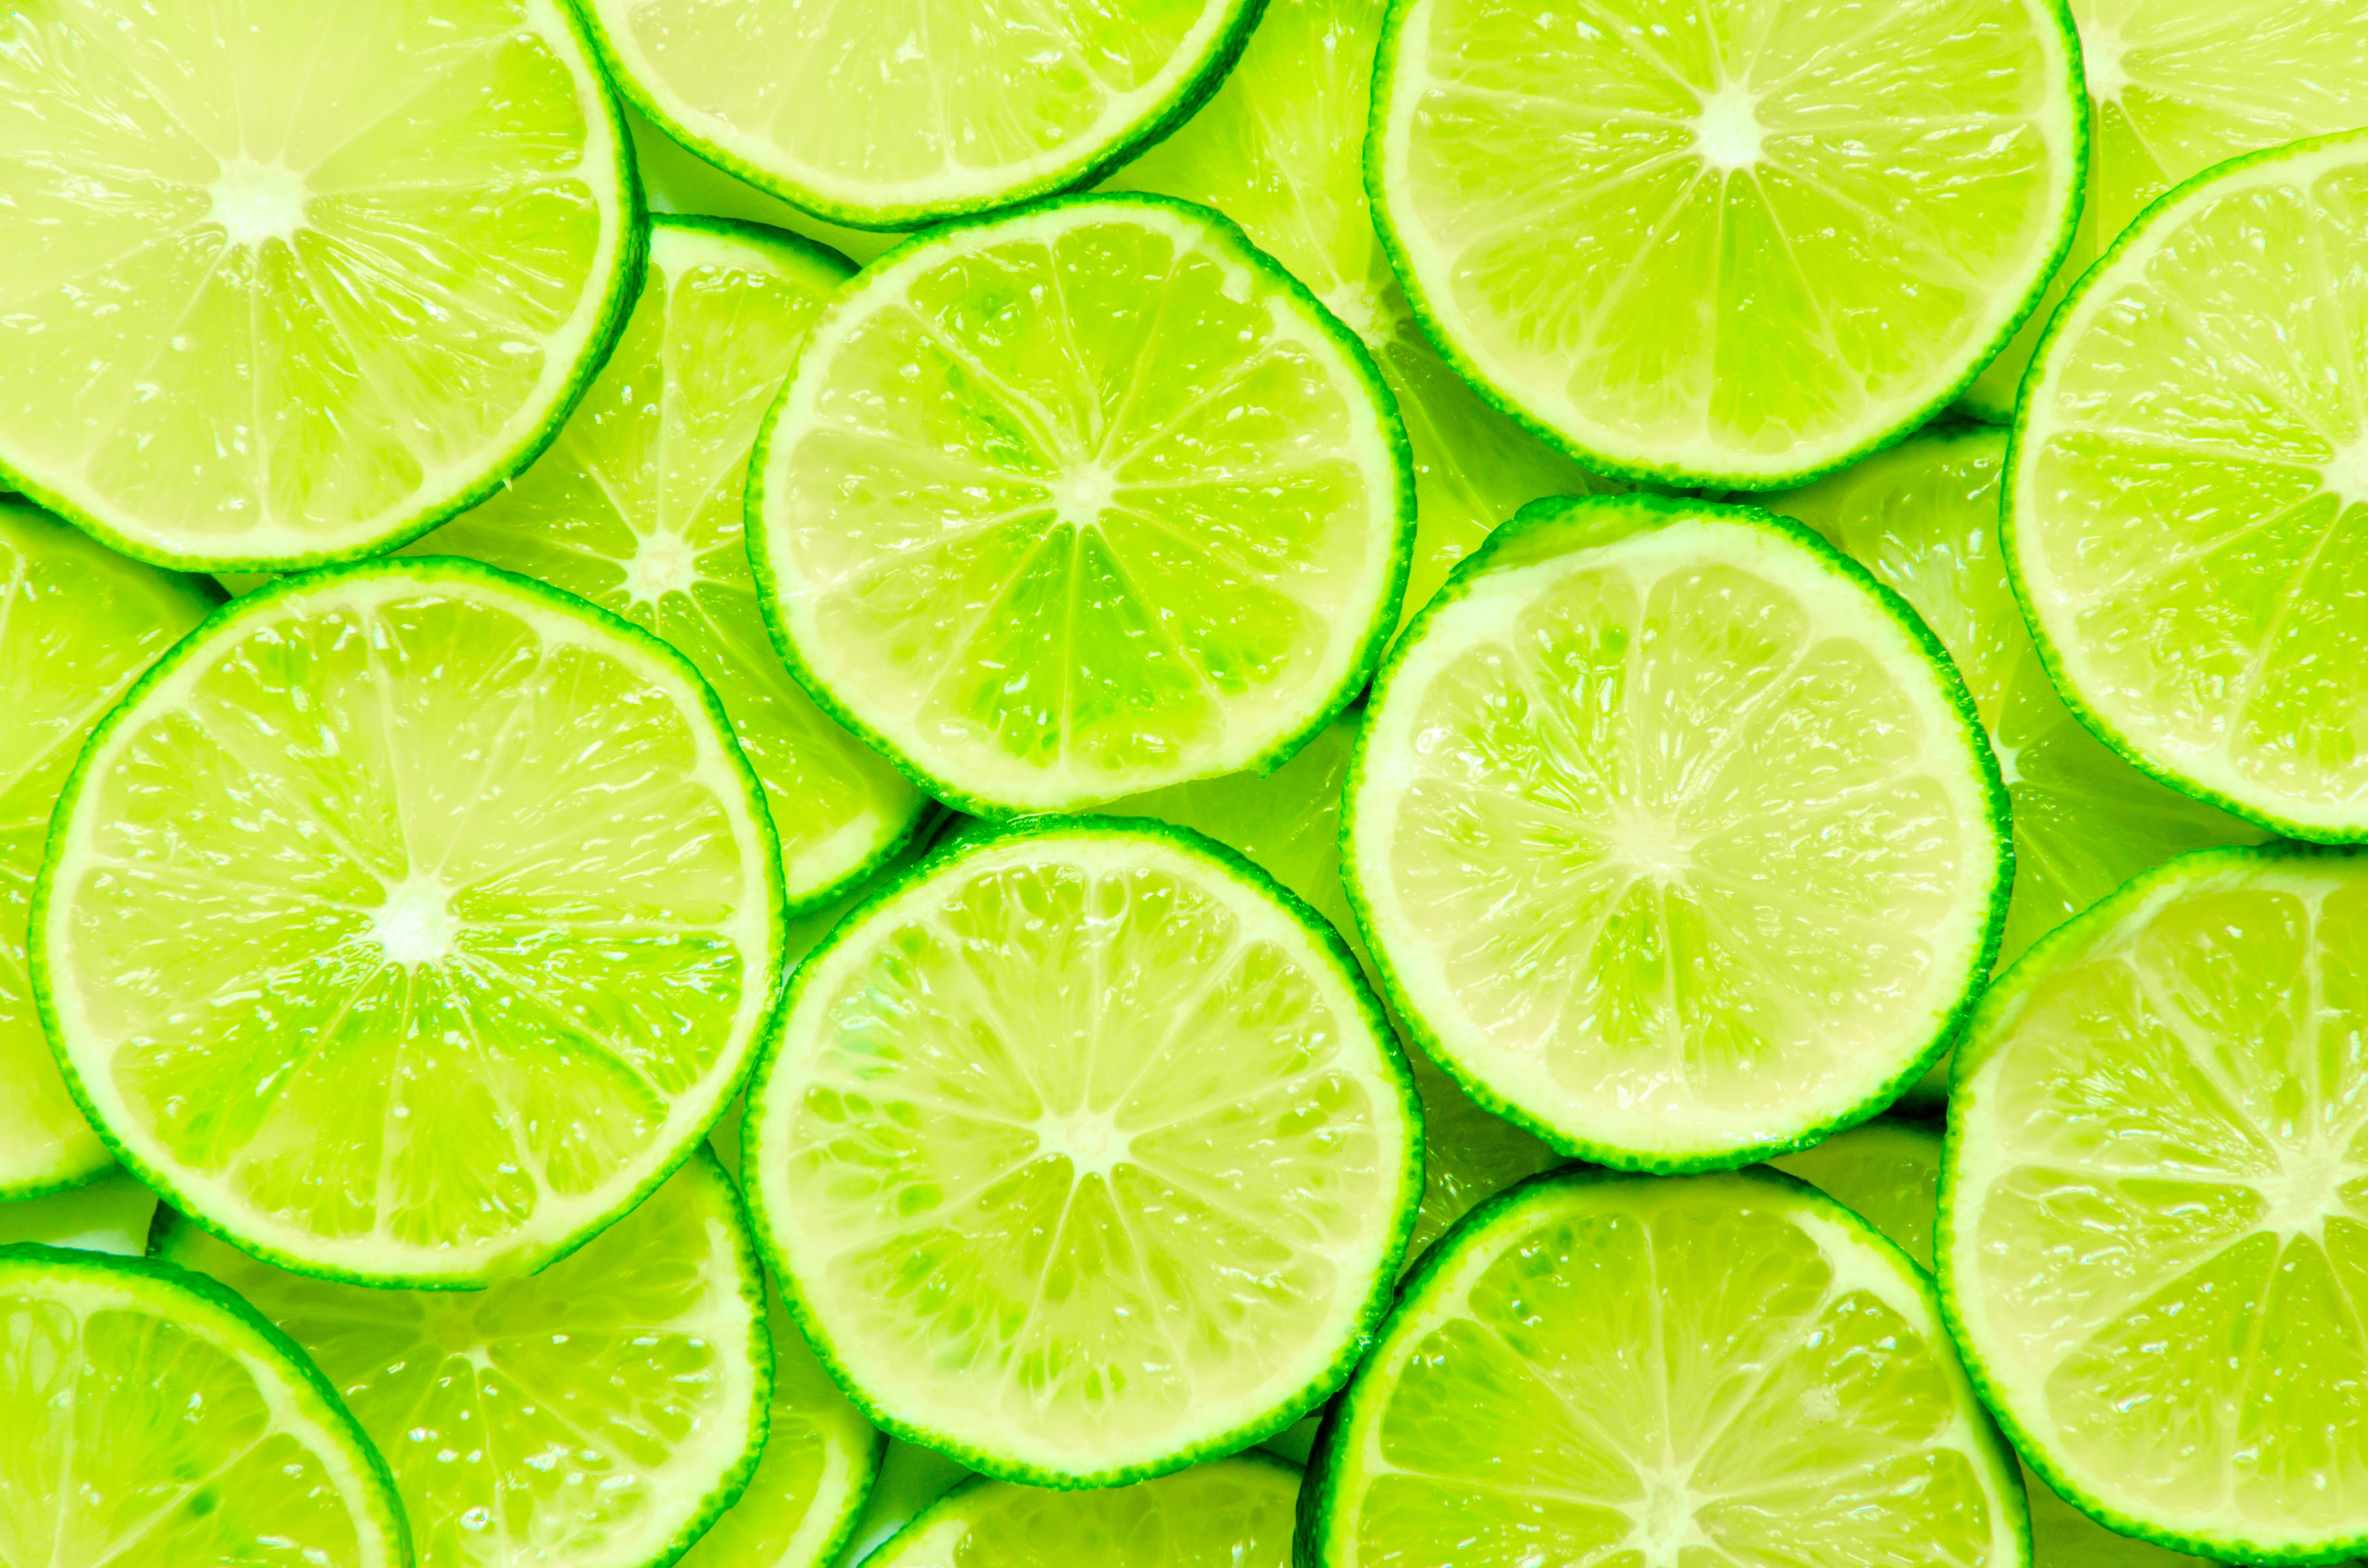 Lime 4k Ultra HD Wallpaper